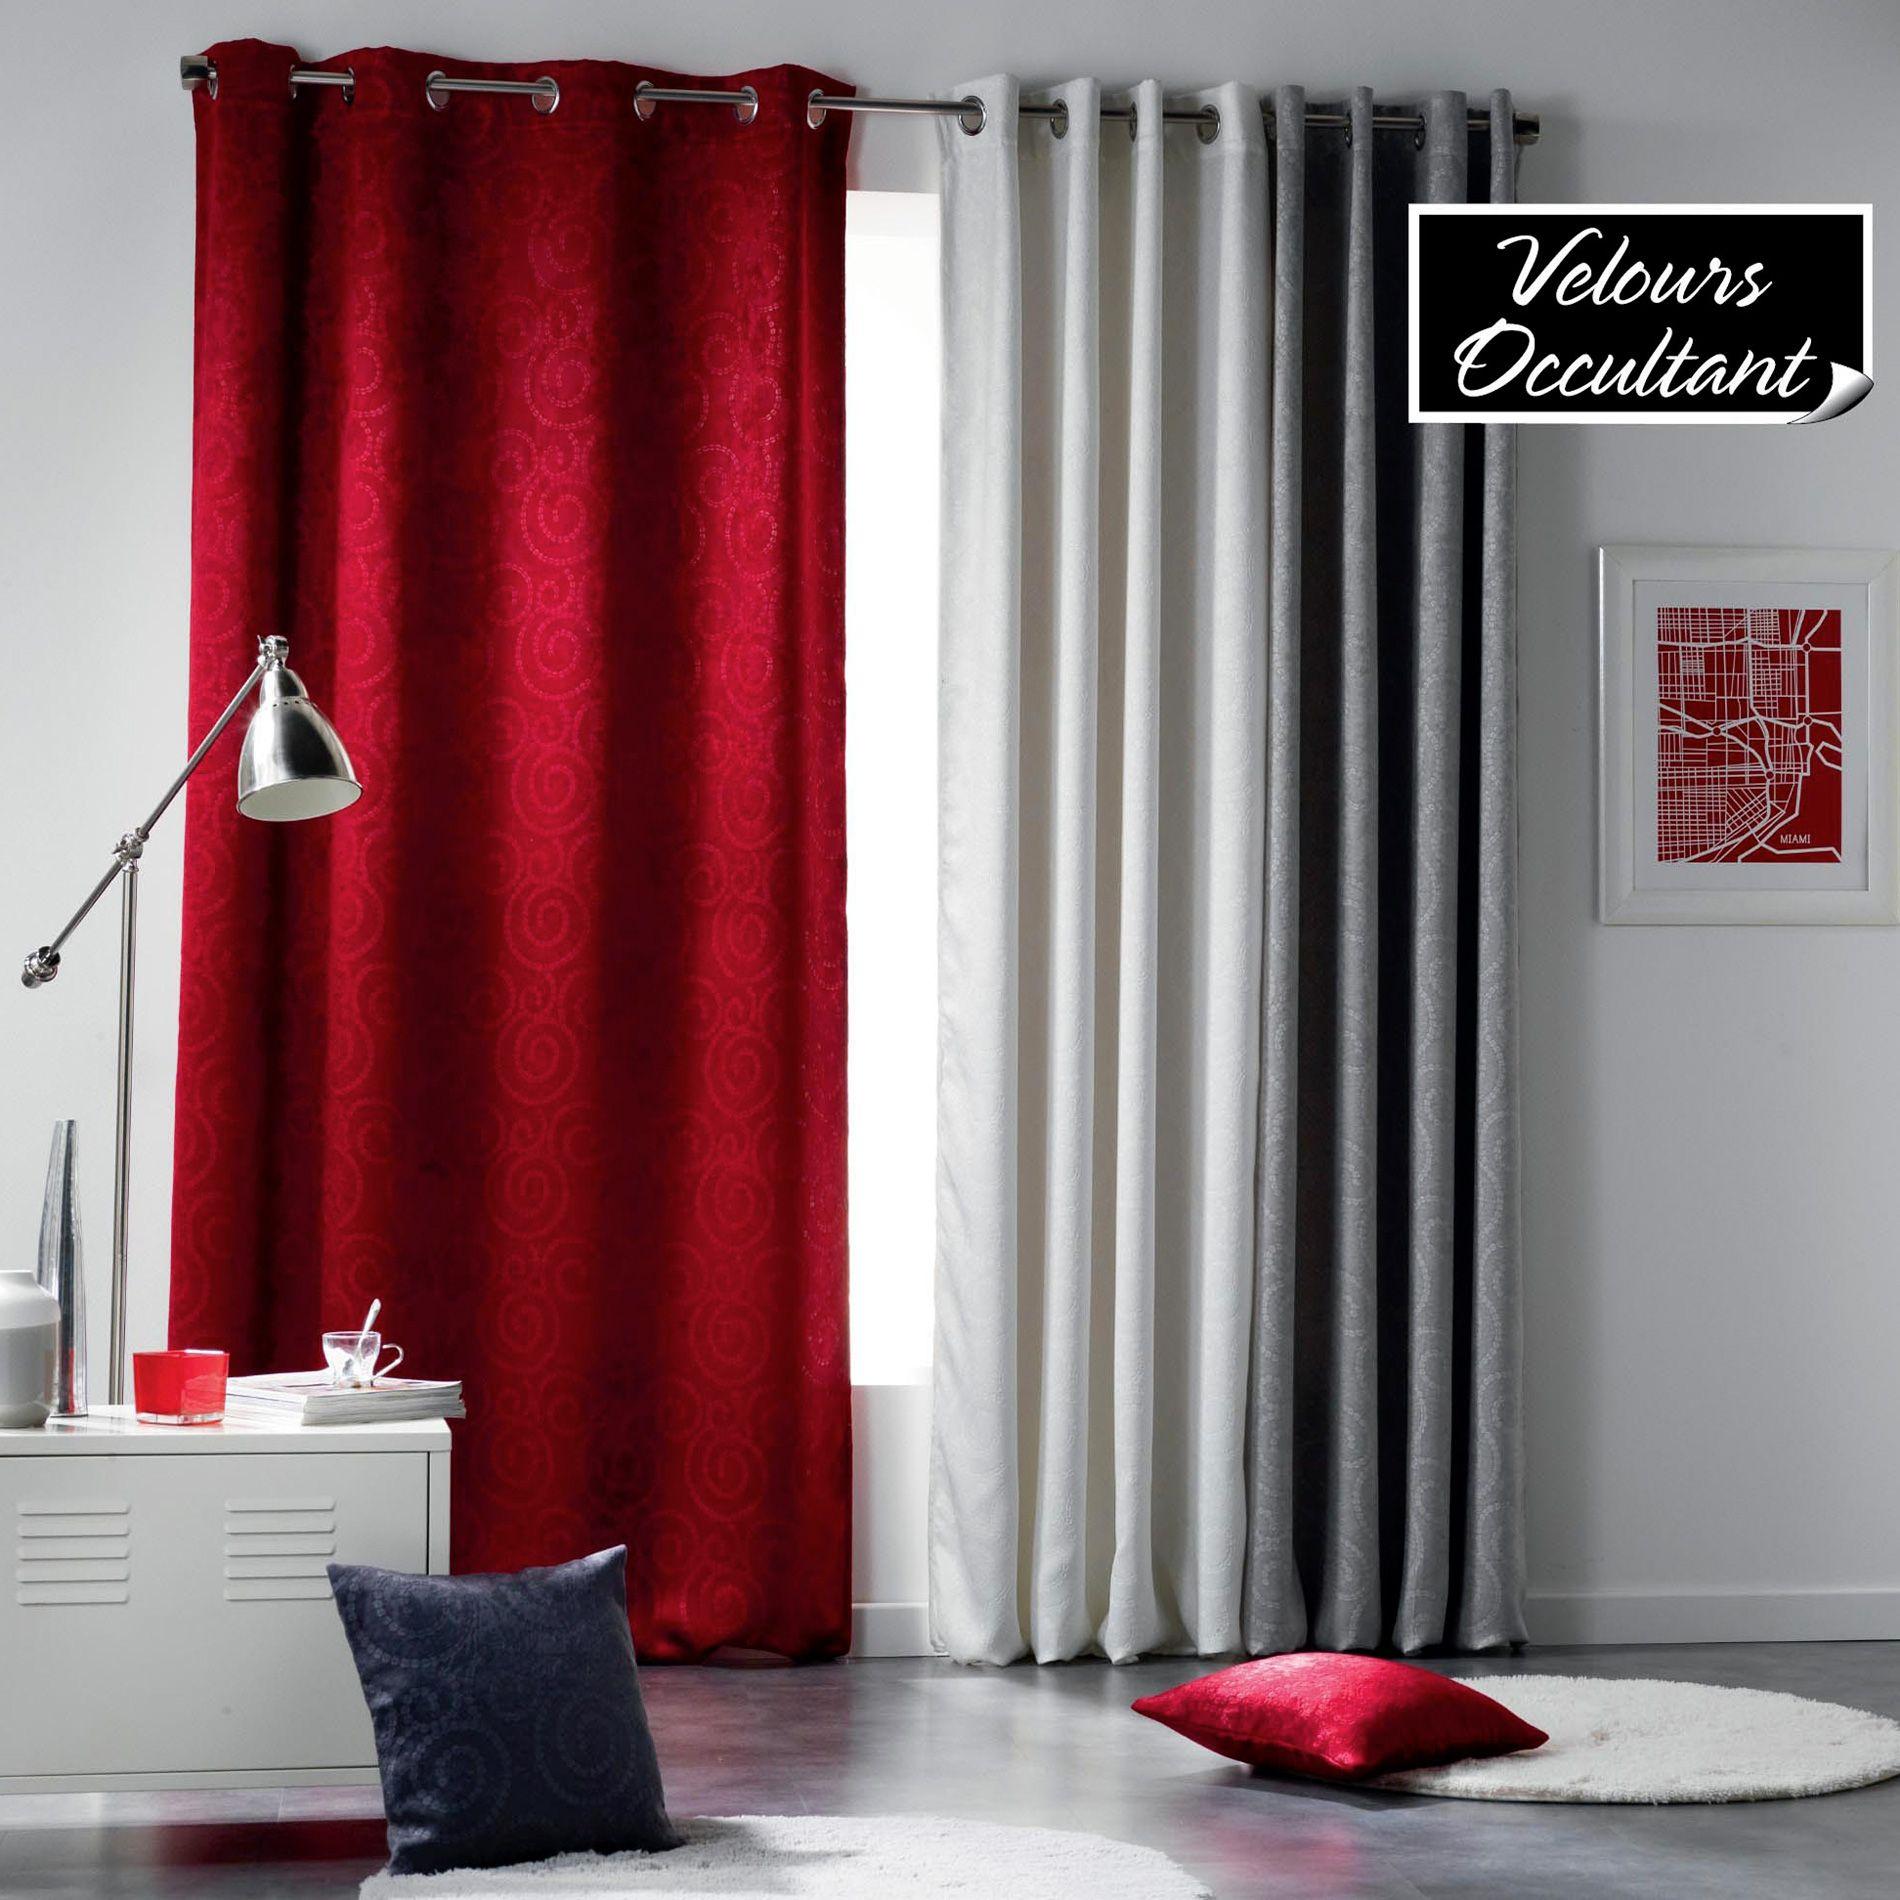 Rideau occultant 140 x 240 cm velours noctua rouge rideau occultant eminza for Rideau maison